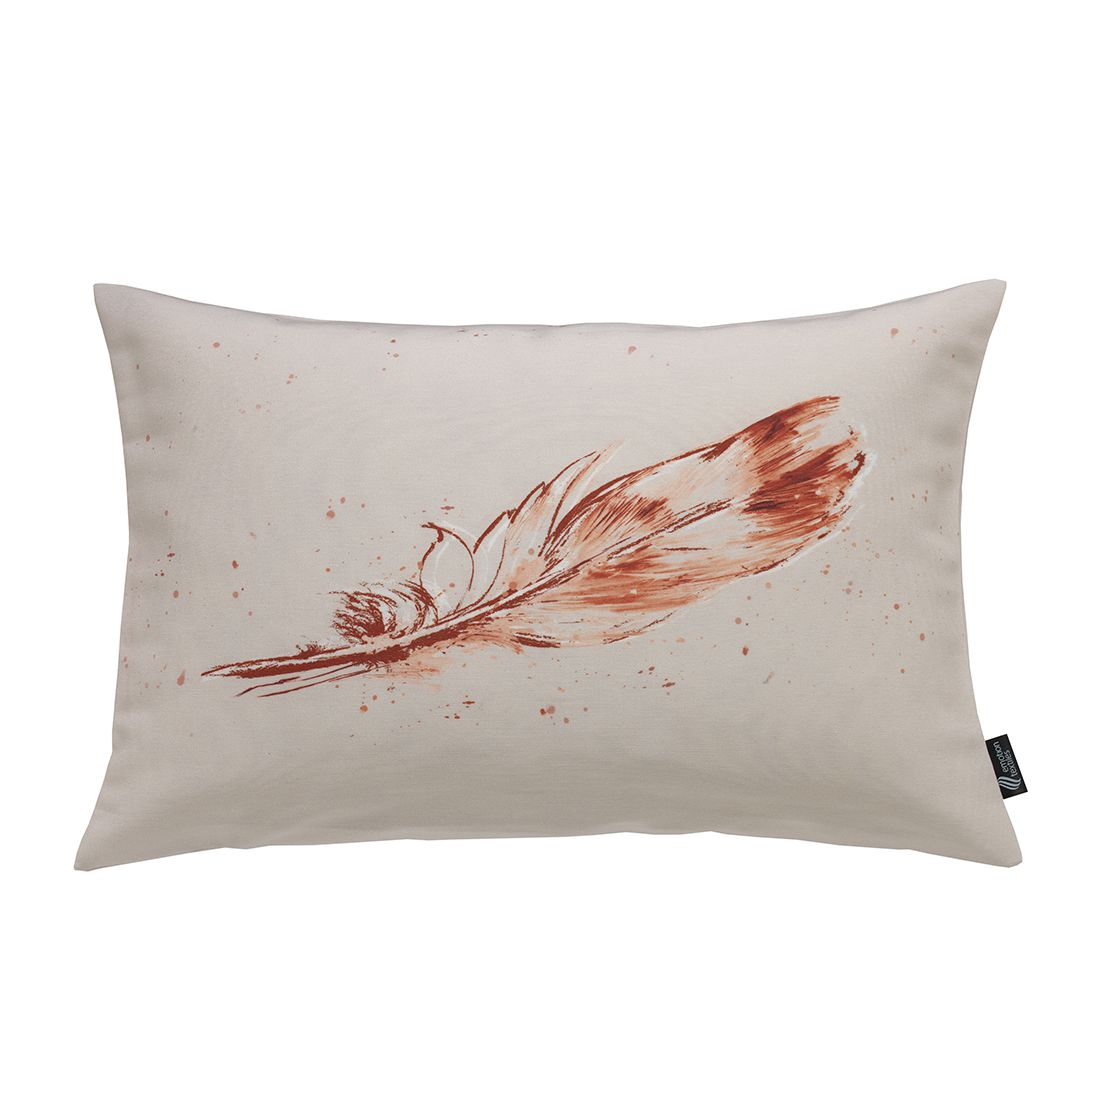 Kissenhülle Temperafeder – Kupfer, emotion textiles günstig